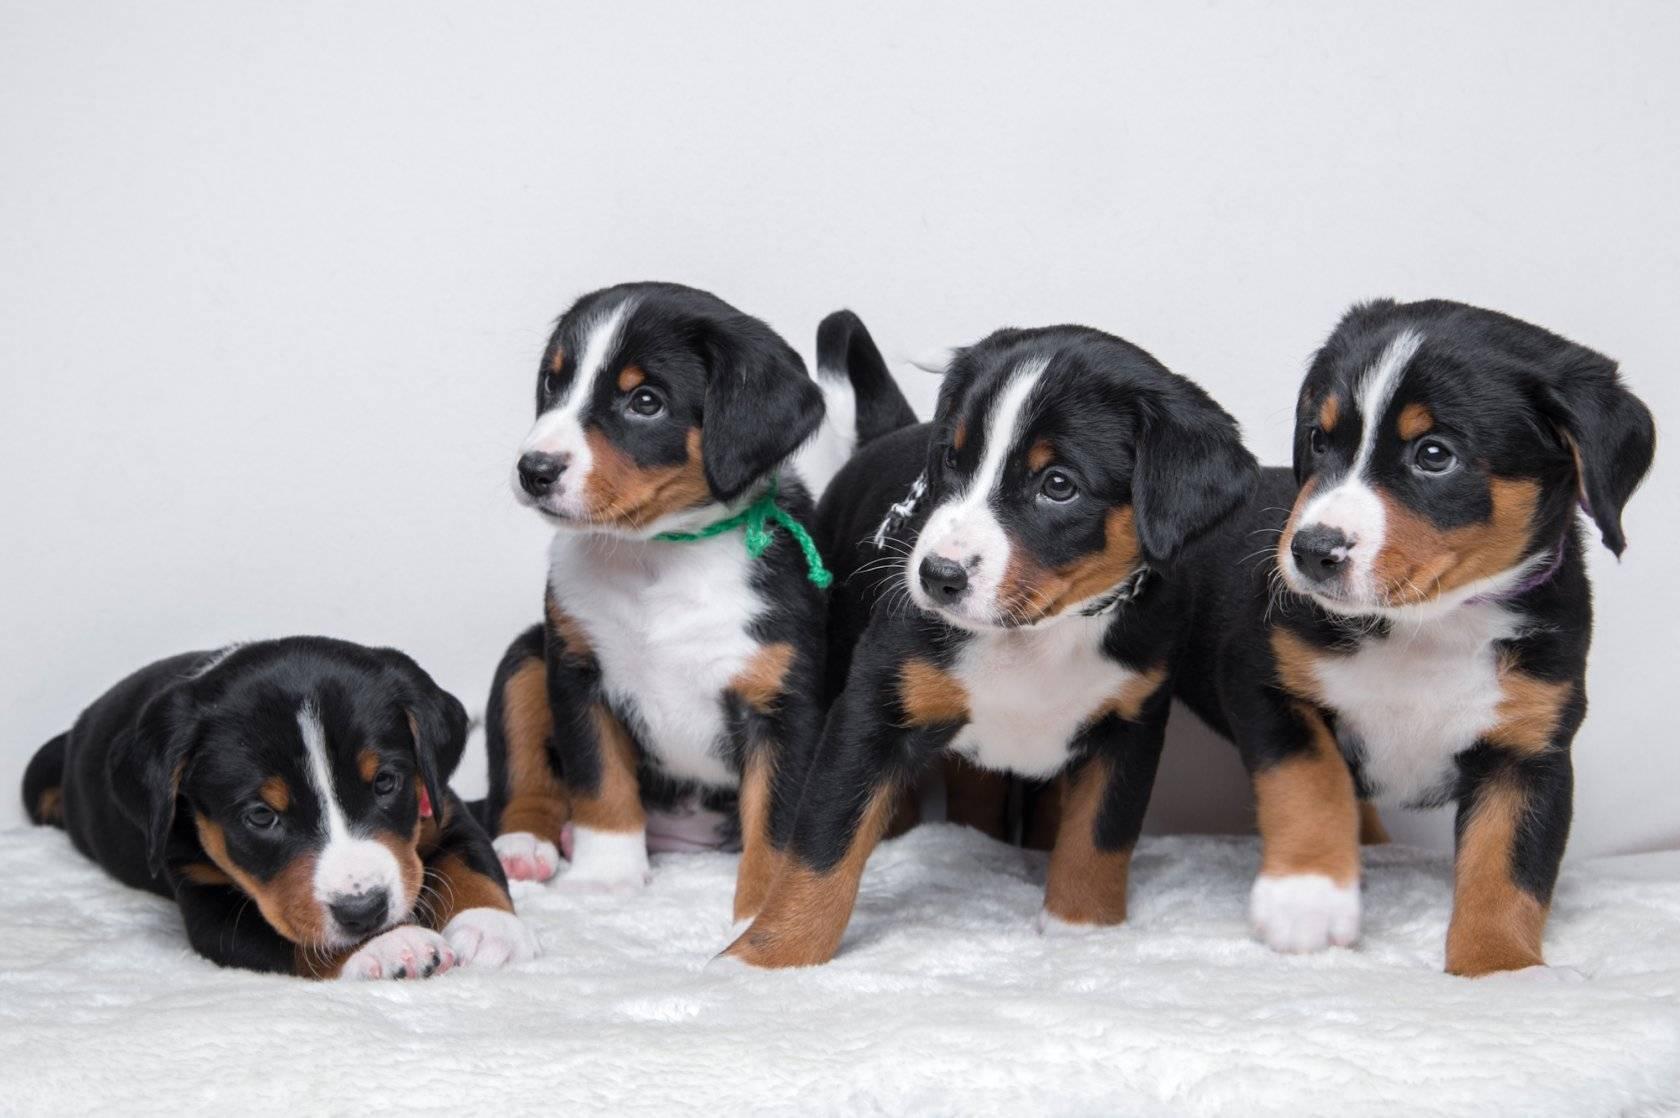 Аппенцеллер зенненхунд: фото и описание собаки. аппенцеллер зенненхунд: хулиган, легко поддающийся дрессировке